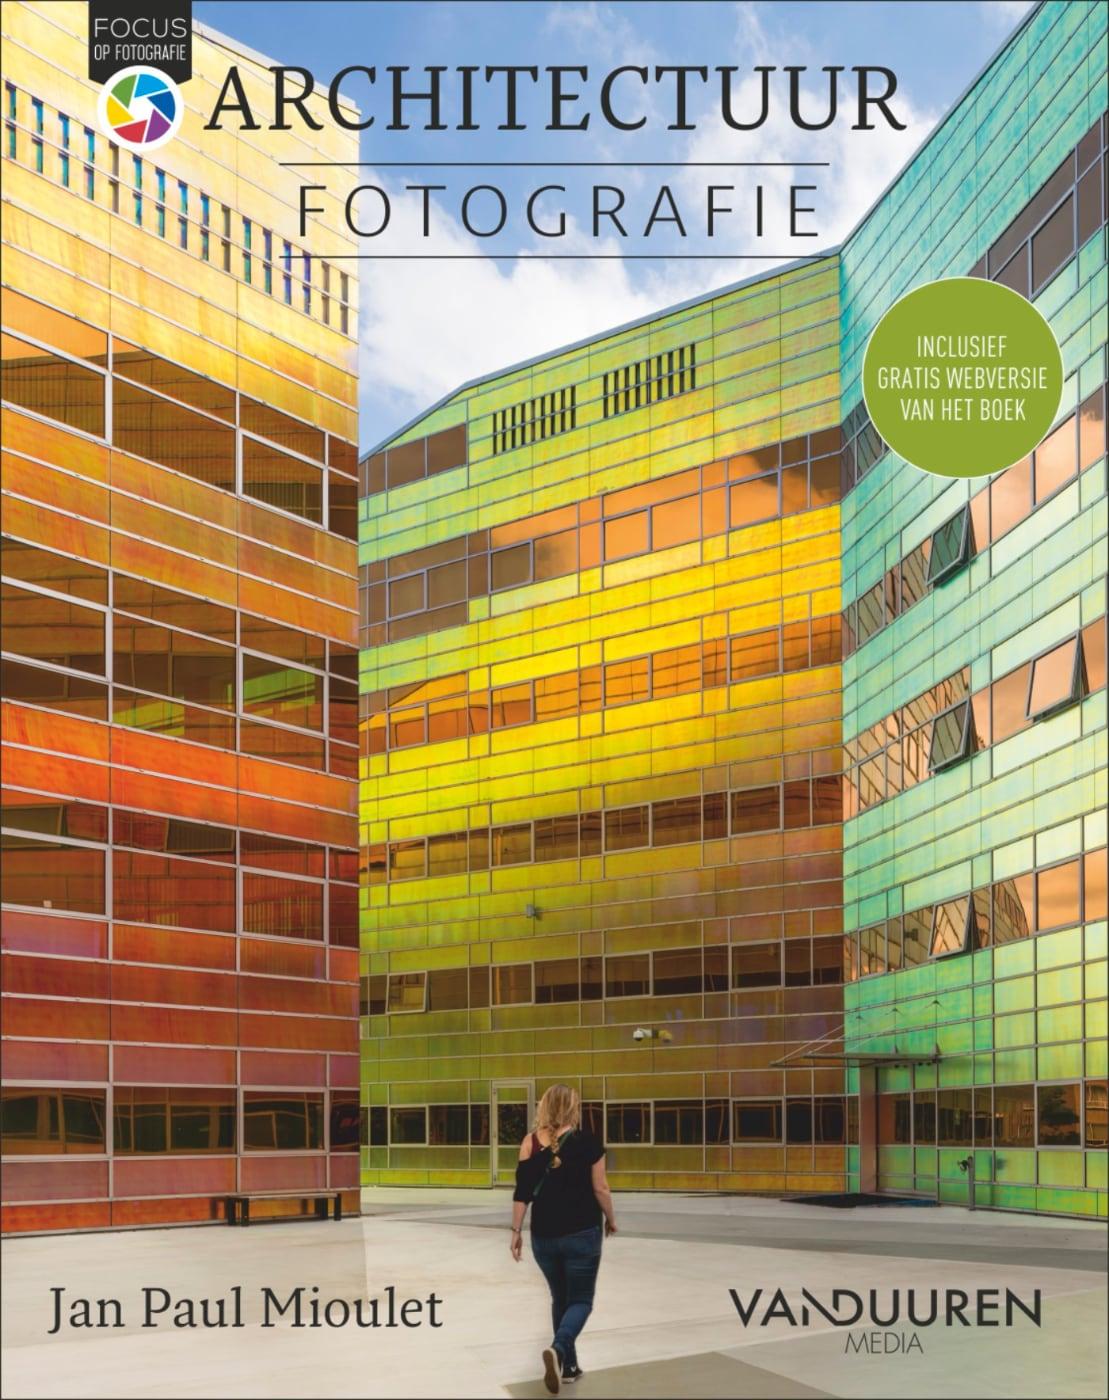 Focus op Fotografie: Architectuurfotografie - Jan Paul Mioulet